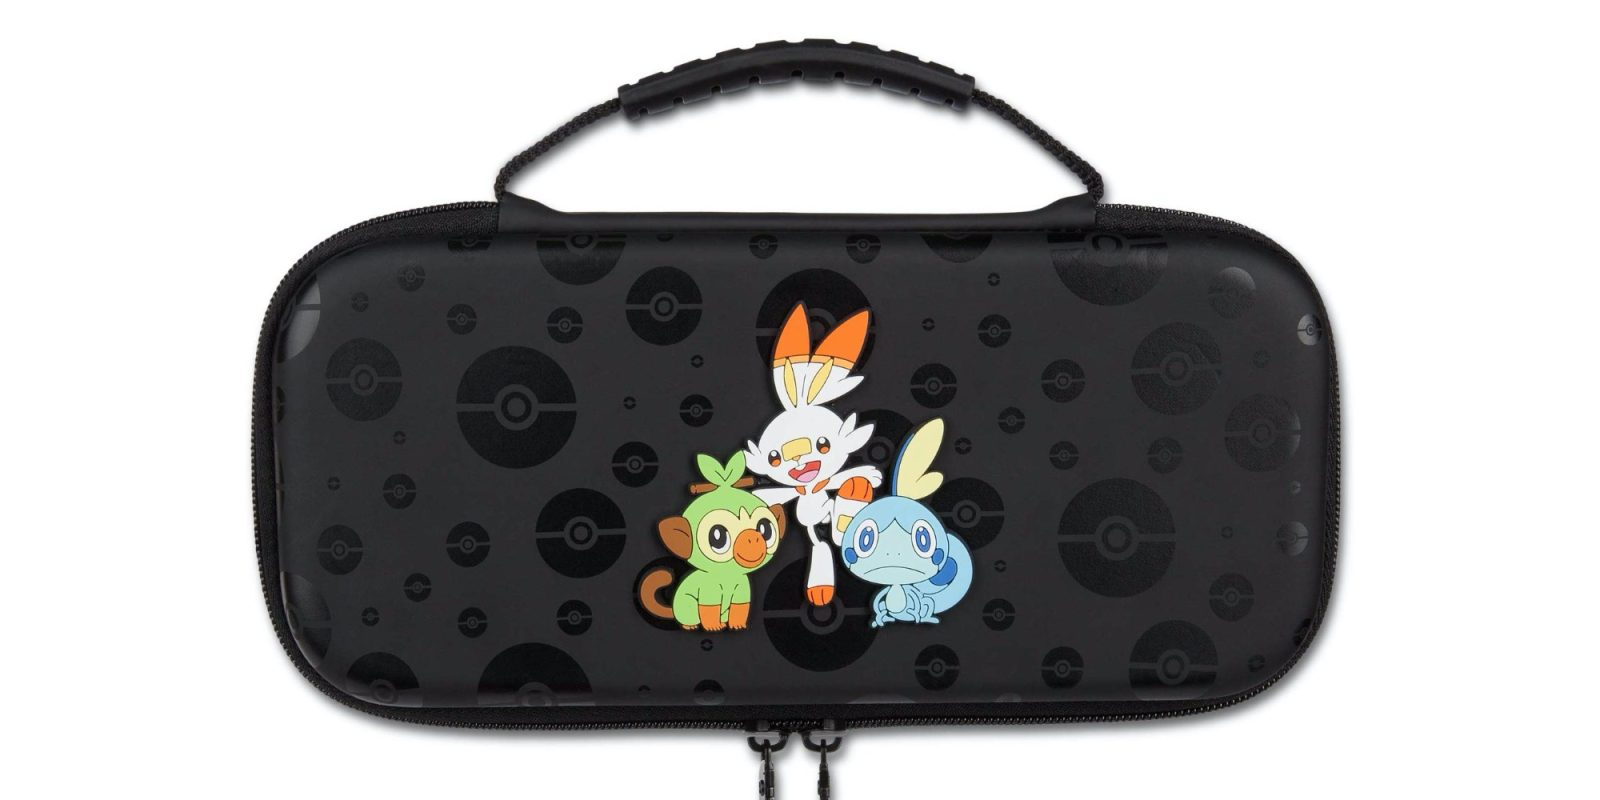 PowerA's Pokémon-themed Nintendo Switch case drops to $20 at Amazon (Reg. $25)